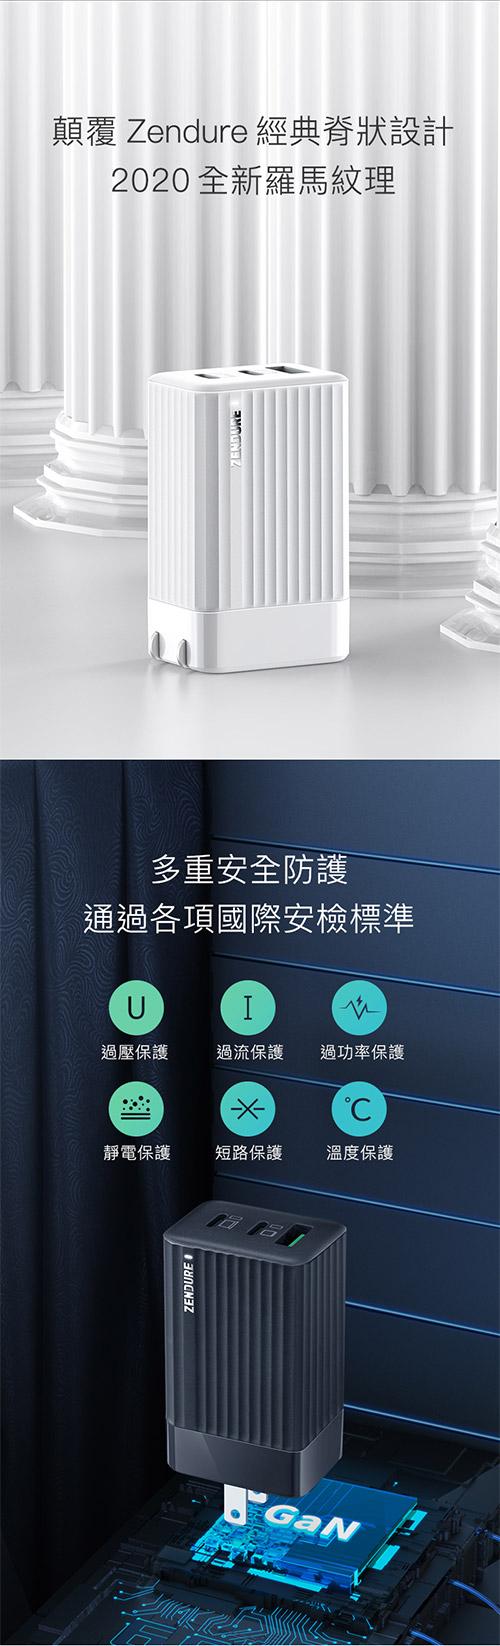 Zendure-SuperPort-S3-65W-PD-三孔快速充電器